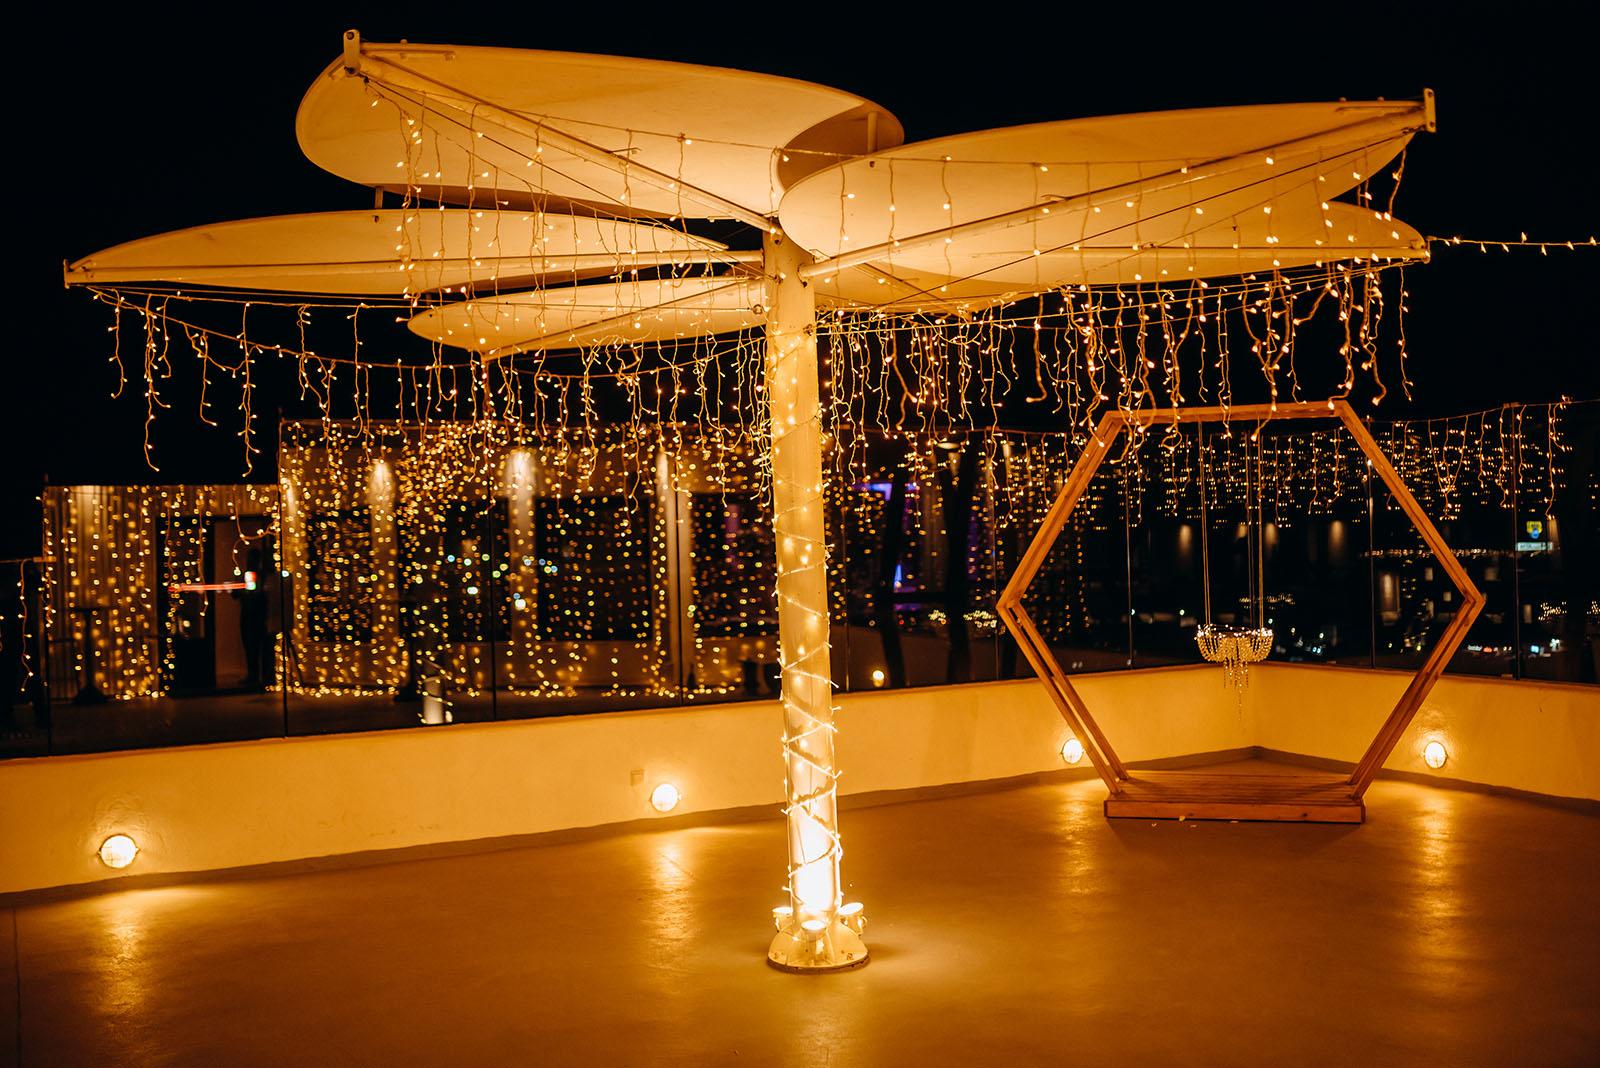 Декор, украшение гирляндами: свадьба на санторини, свадебное агентство Julia Veselova - Фото 3